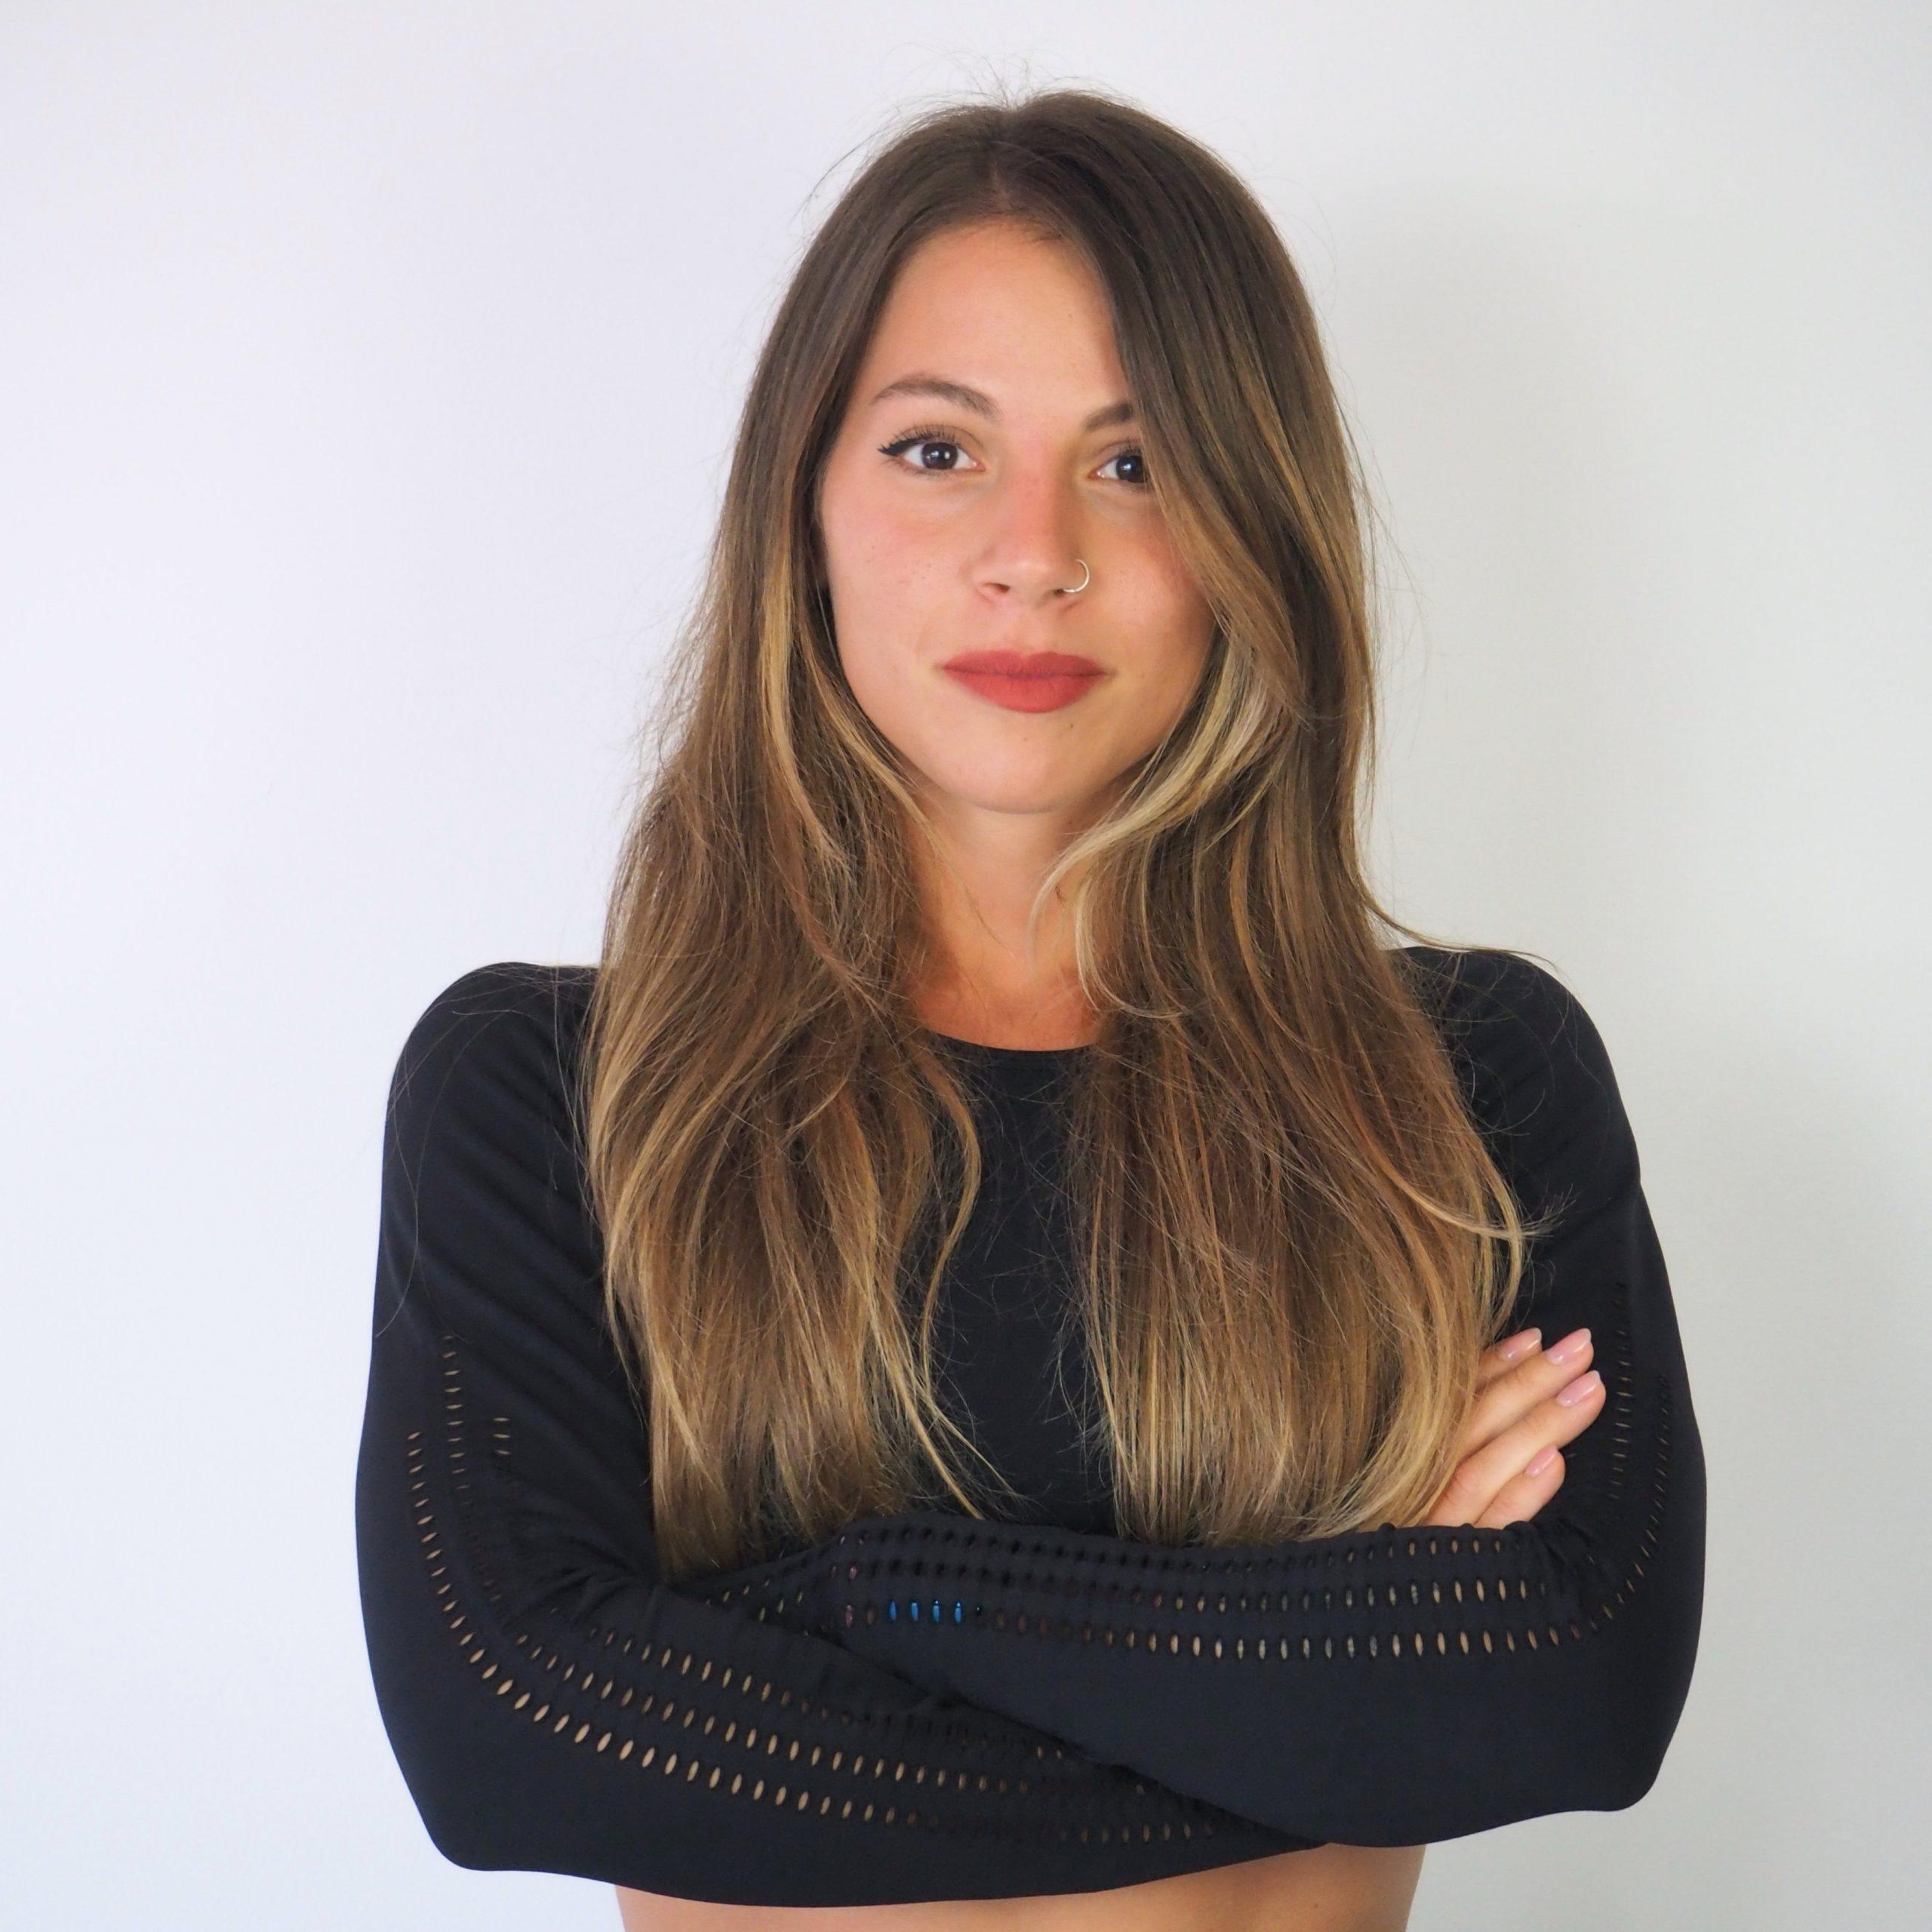 Samantha Pinato